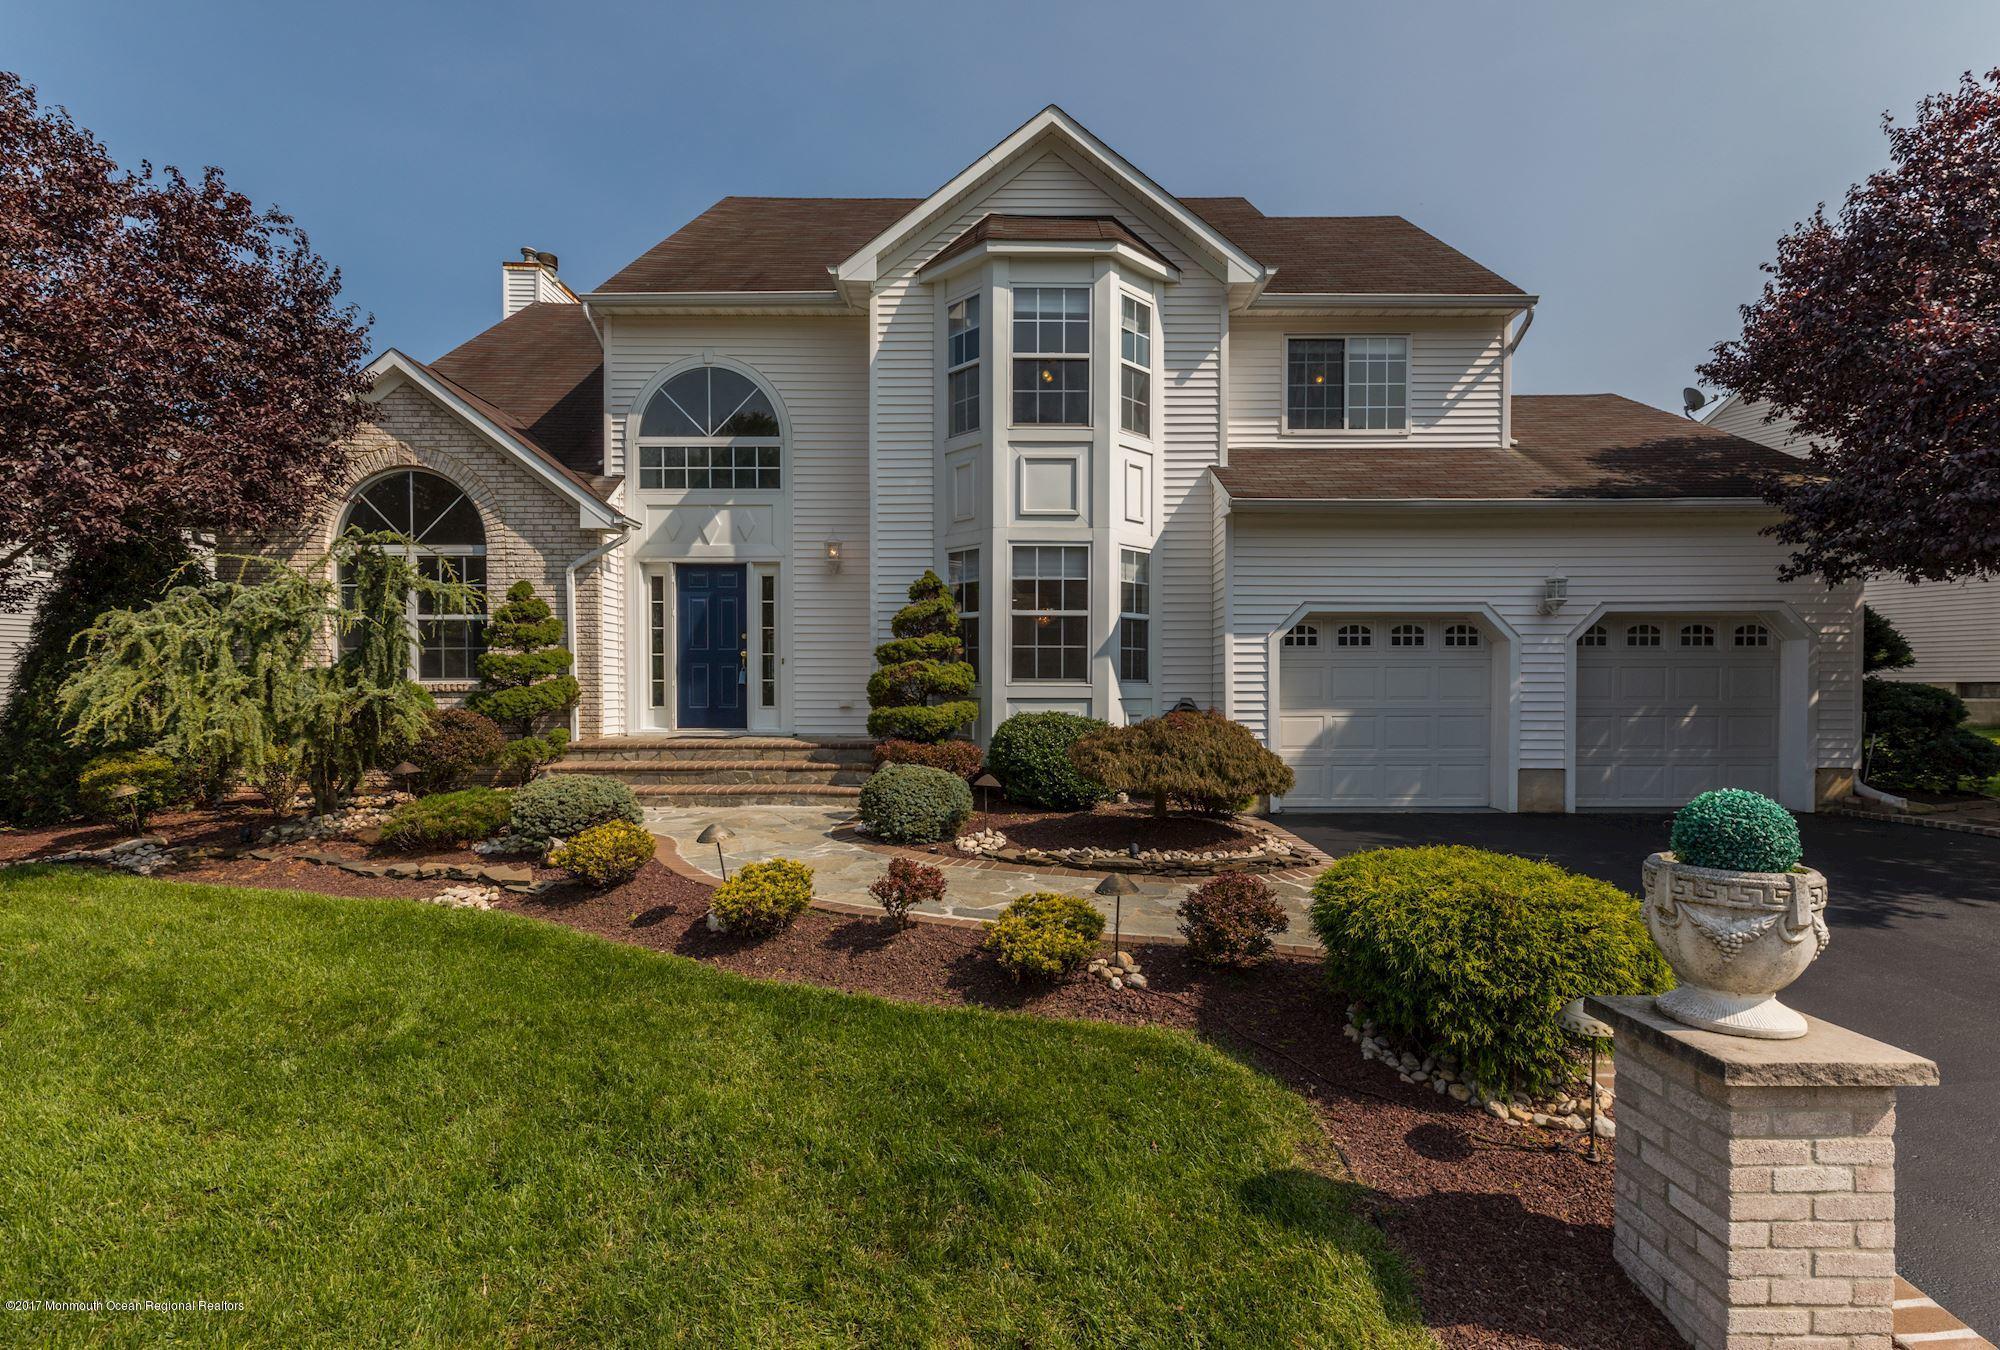 Einfamilienhaus für Verkauf beim 51 Winding Brook Drive 51 Winding Brook Drive Matawan, New Jersey 07747 Vereinigte Staaten